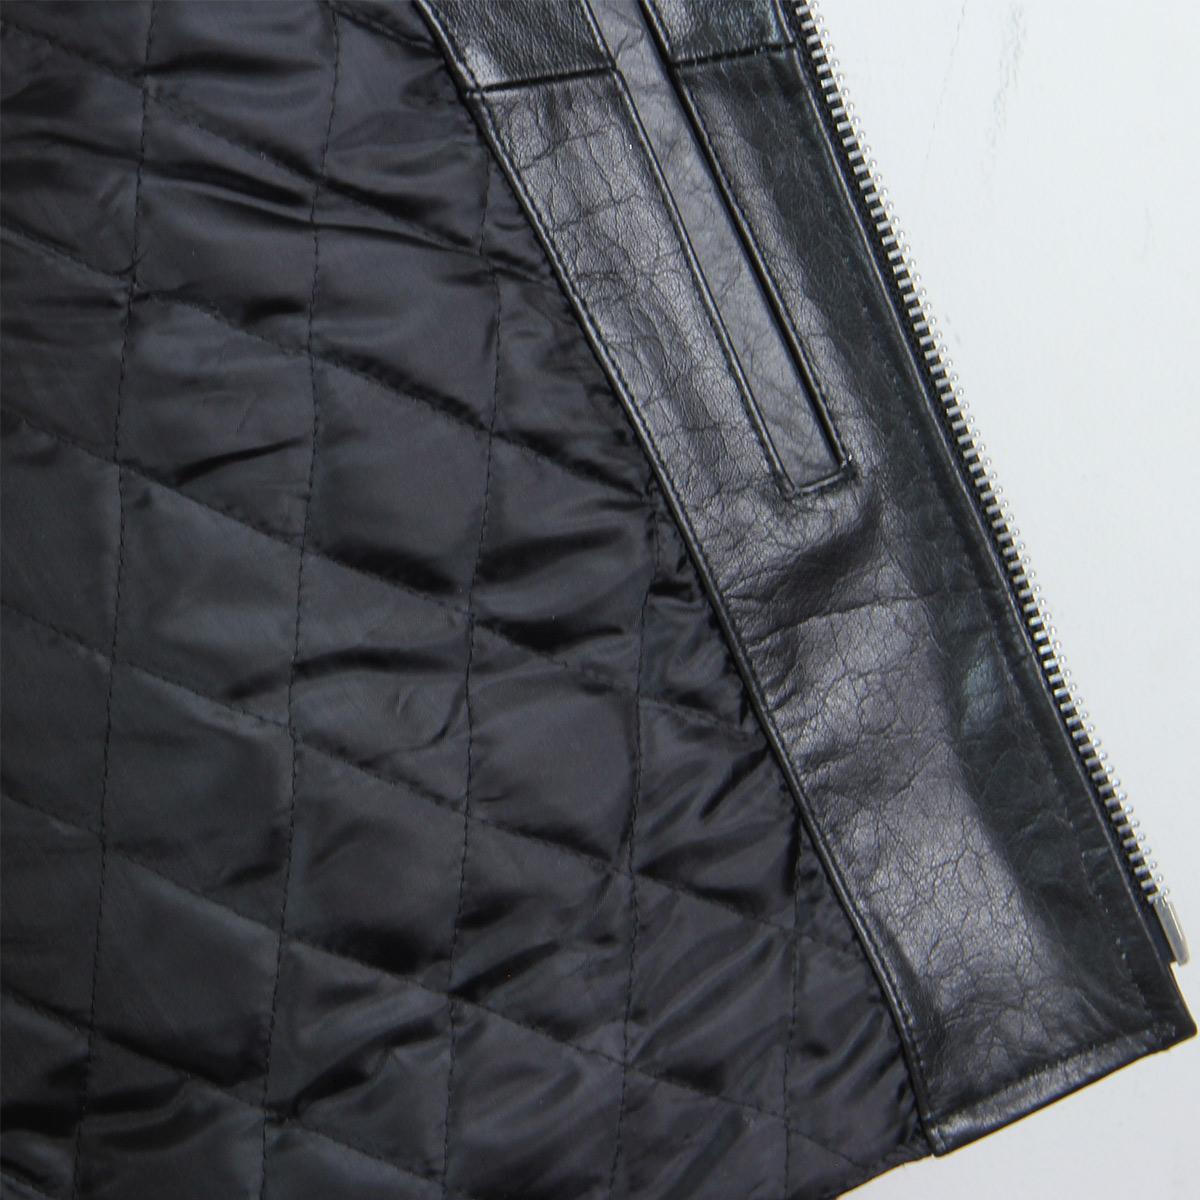 Black TOP GRADE Leather Motorcycle Biker Jacket 4